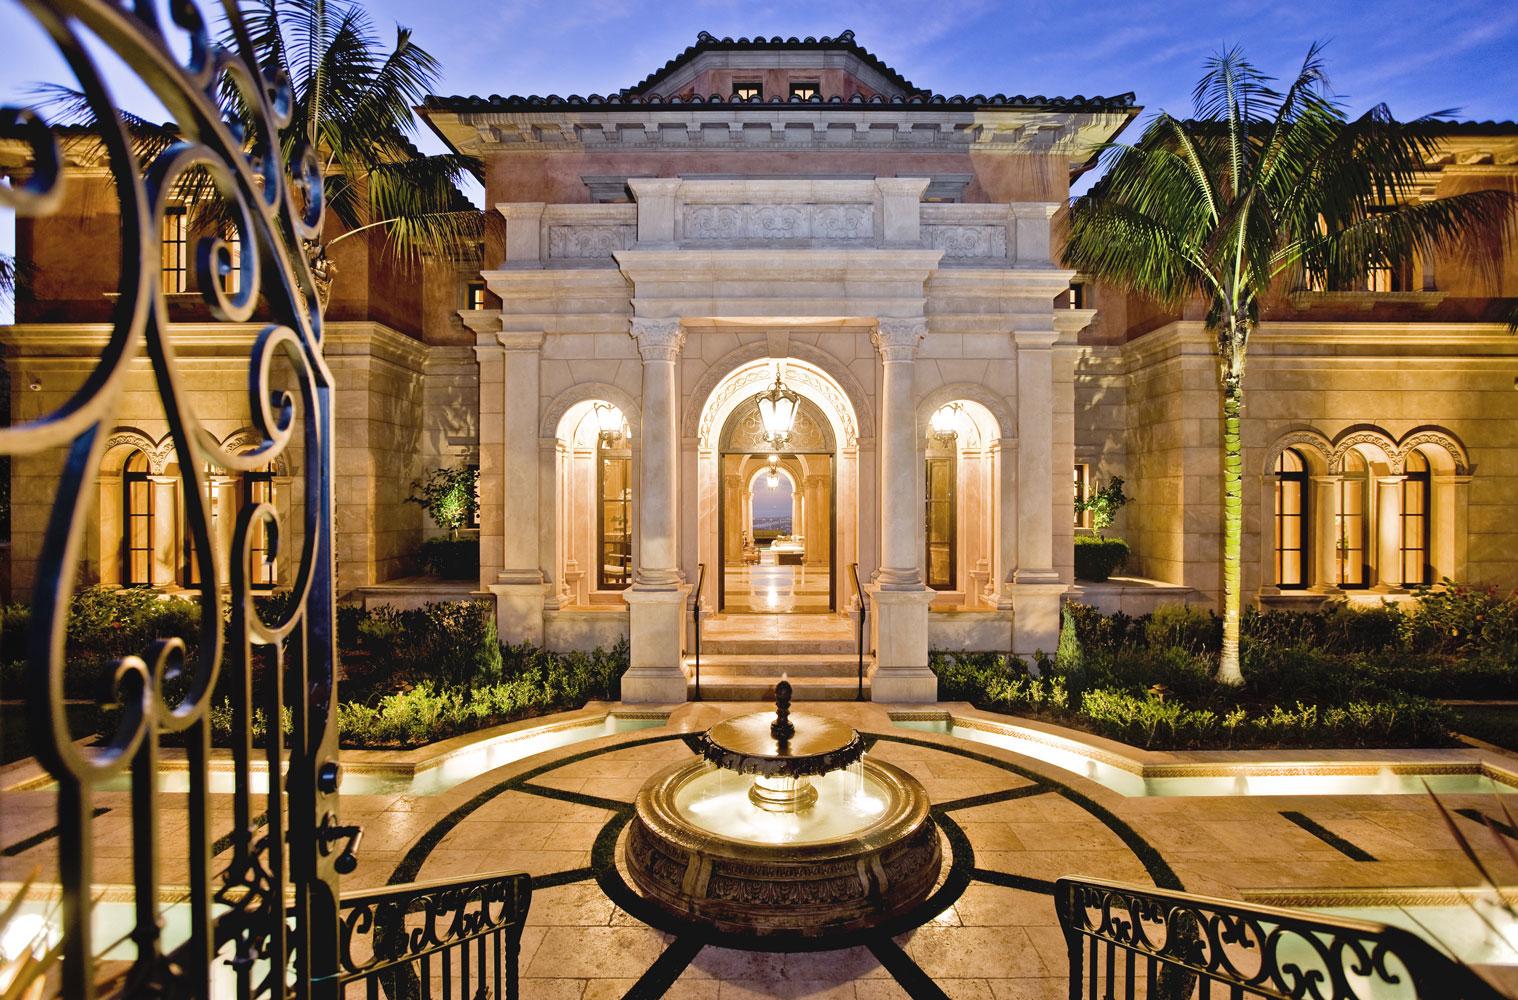 Contemporary-Italianate-Front-Entryway-Fountain-Columns-Corbin-Reeves.jpg